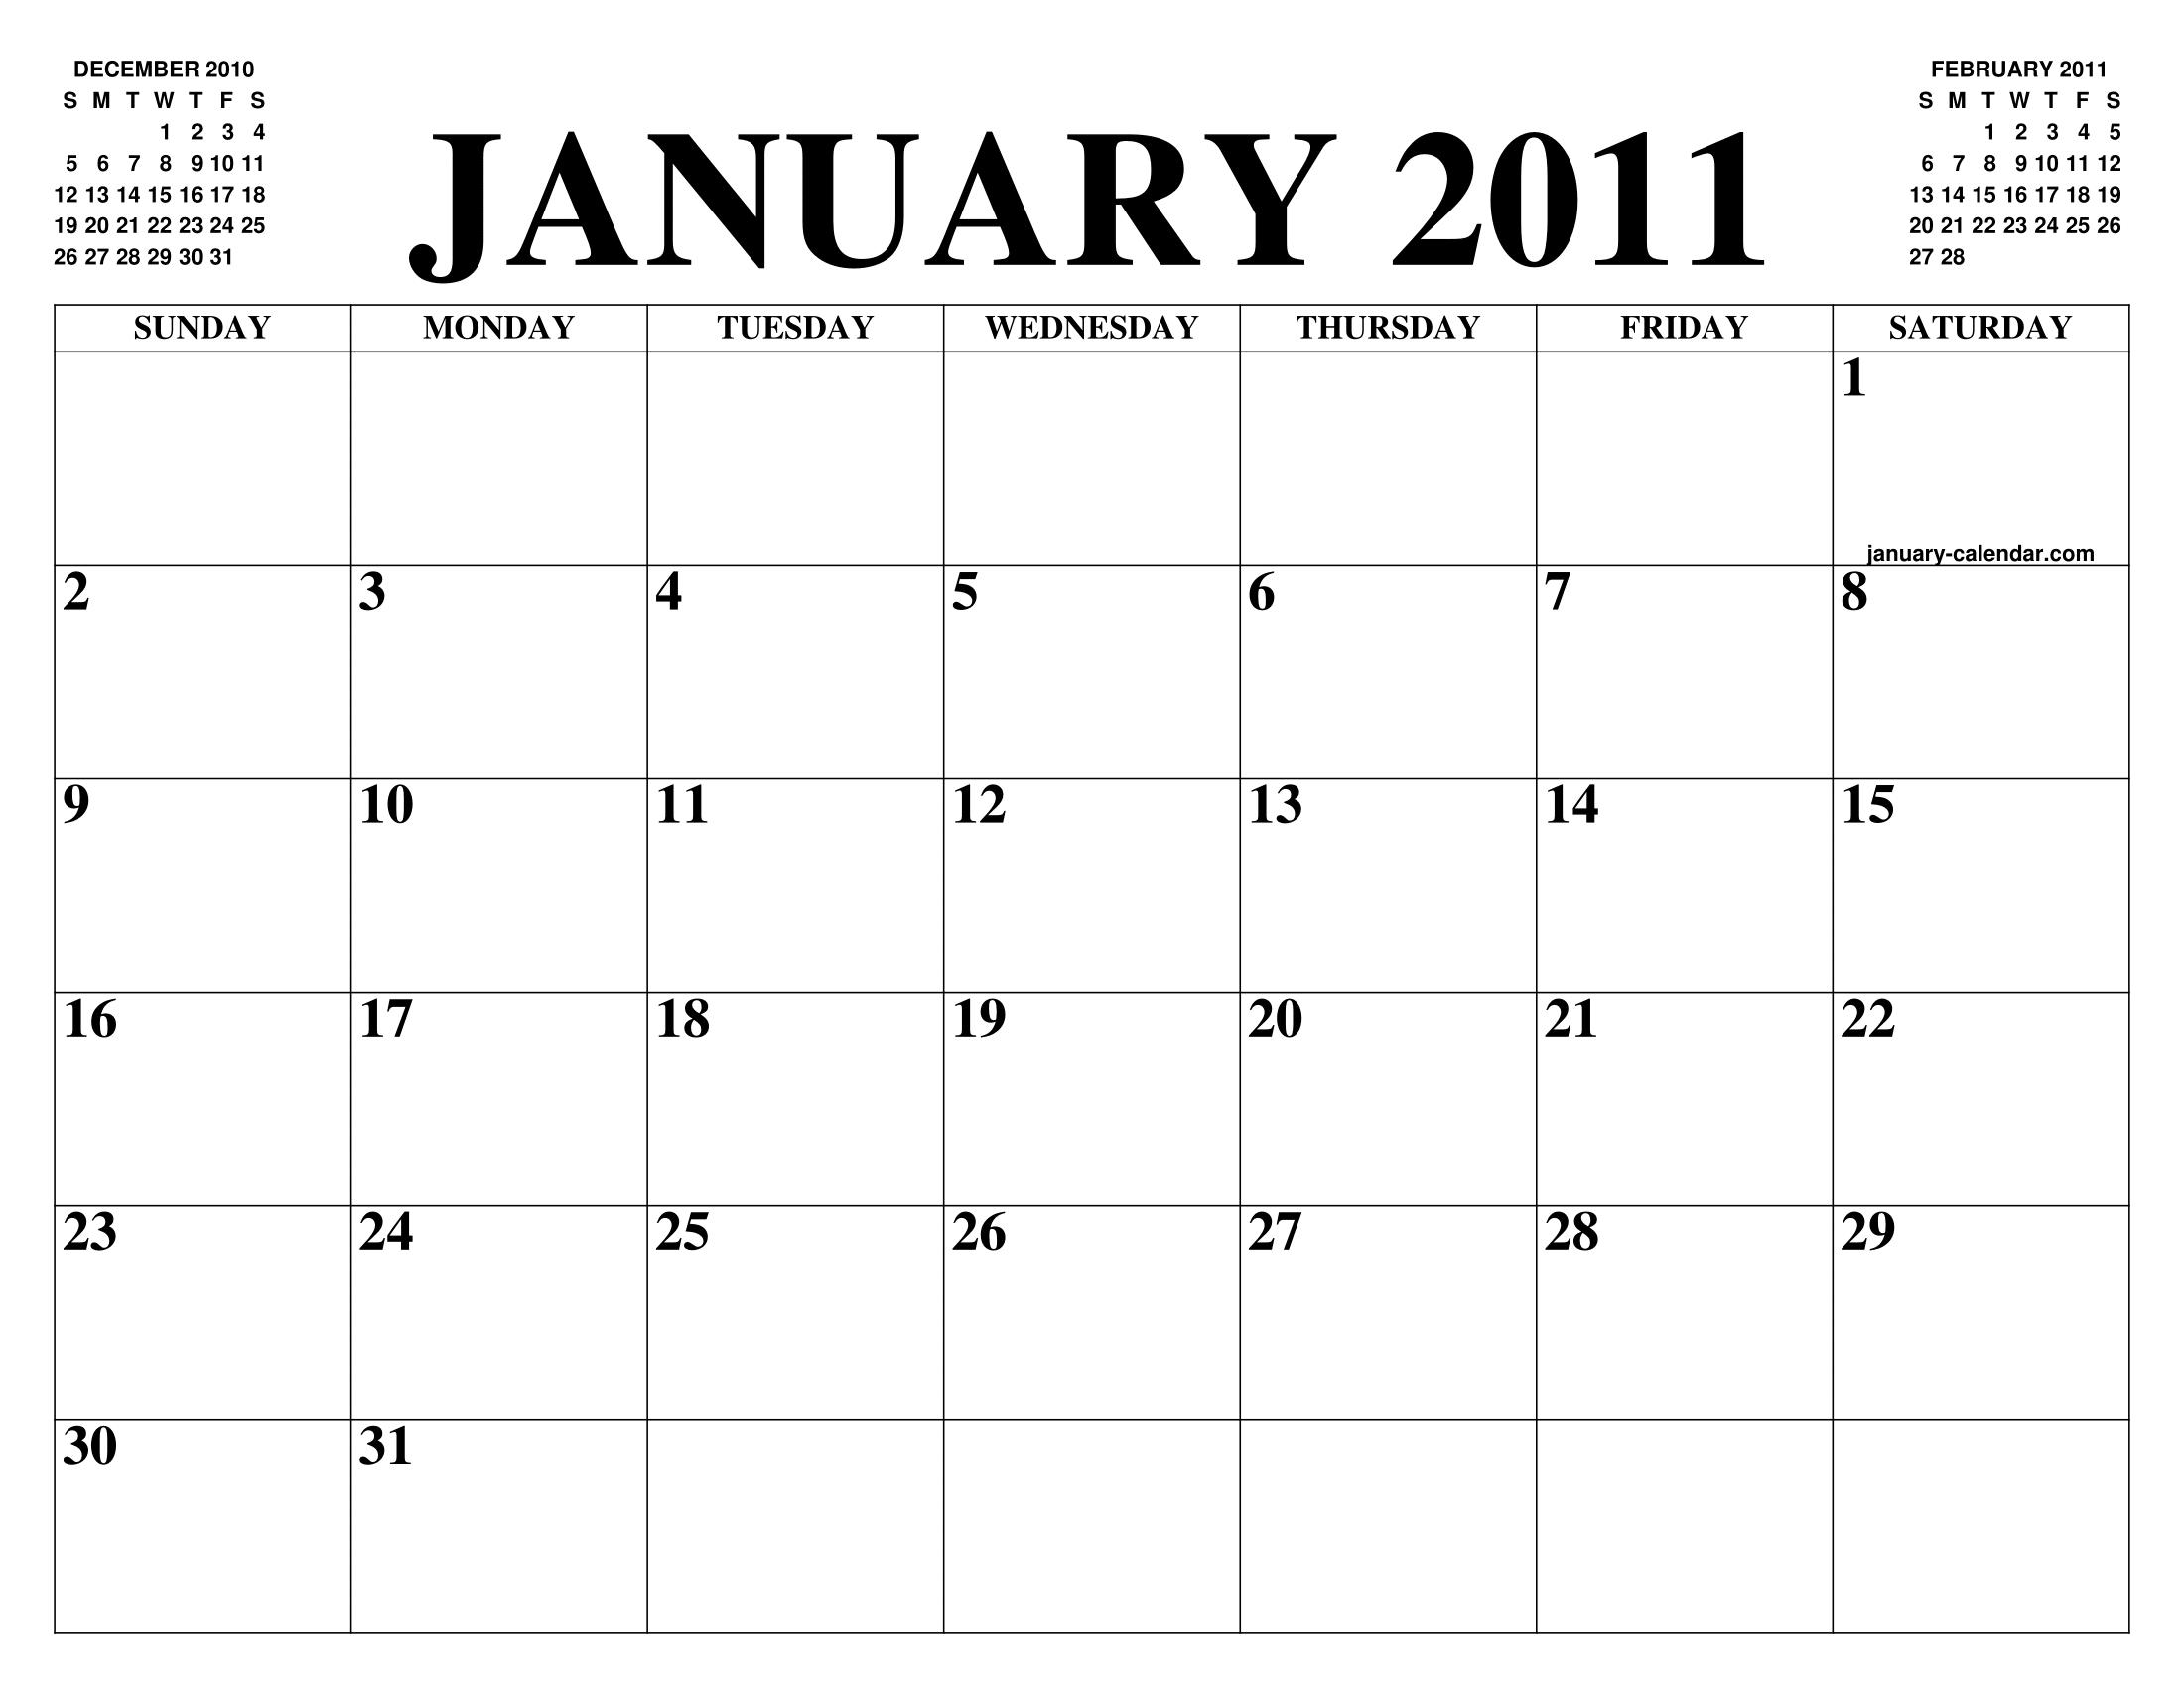 JANUARY 2011 CALENDAR OF THE MONTH: FREE PRINTABLE JANUARY ...